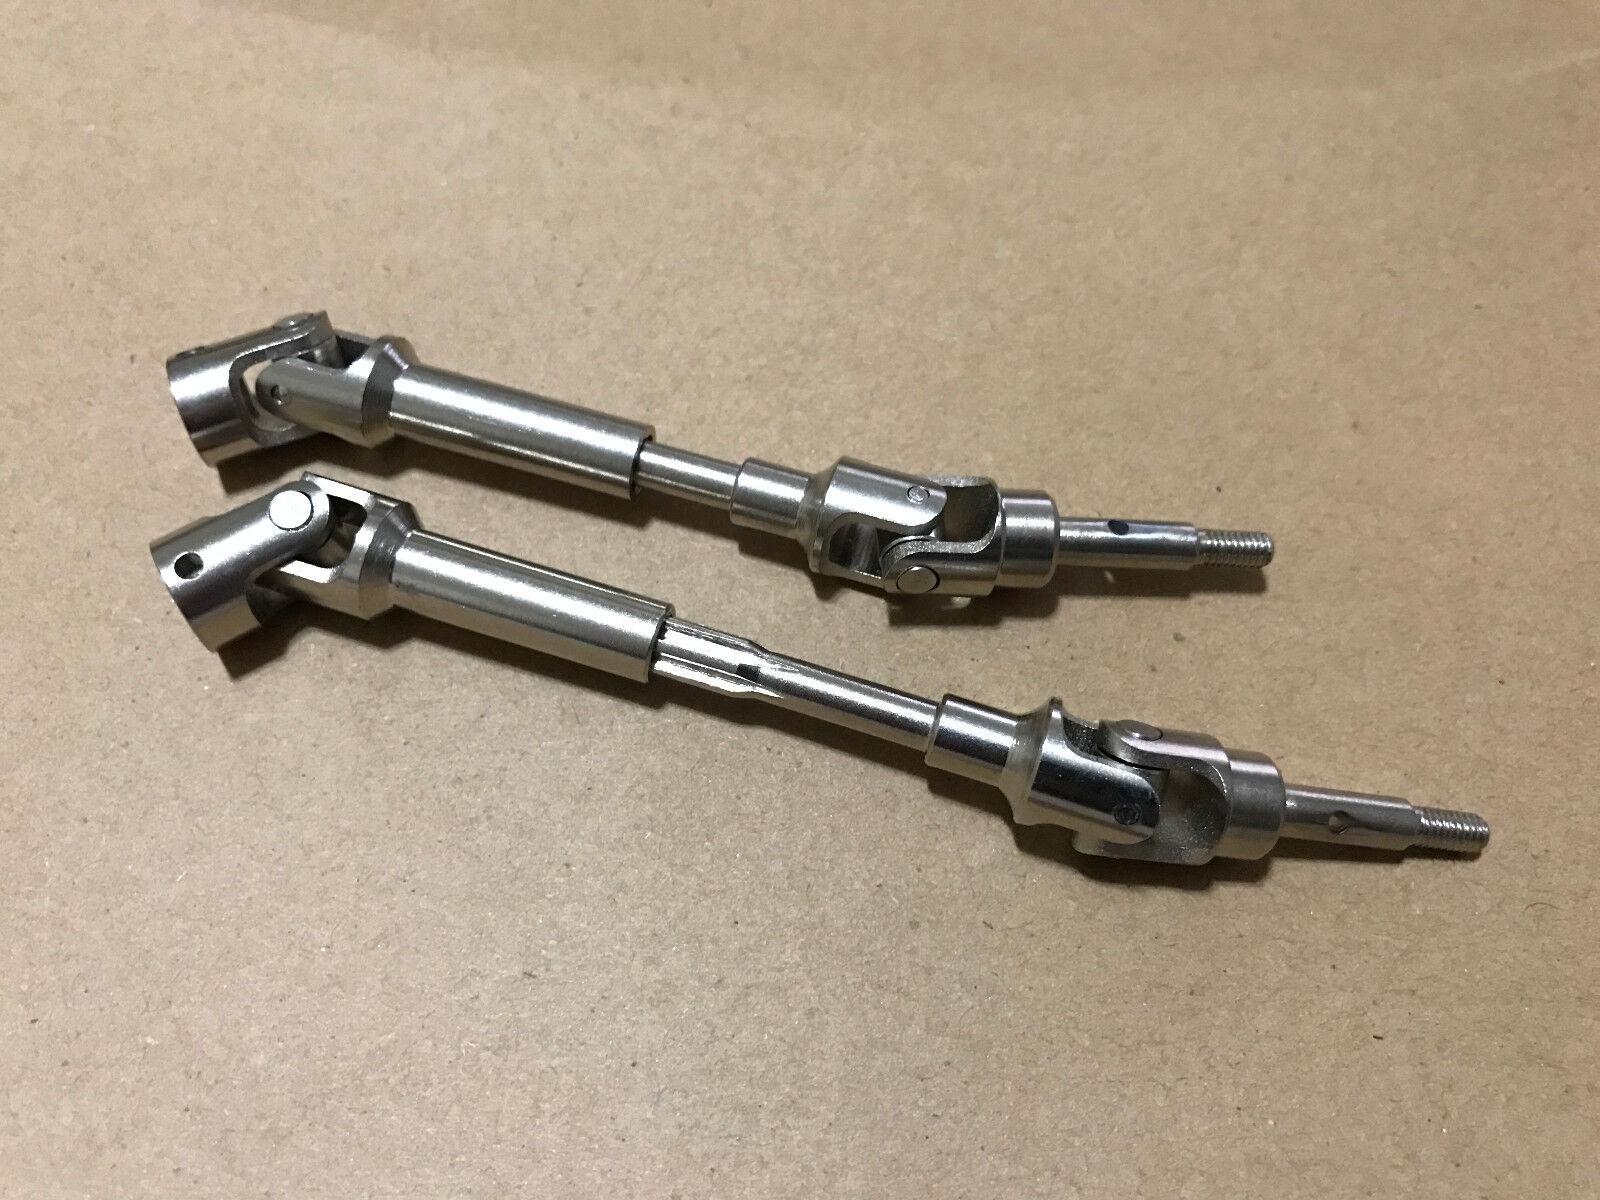 1 10 Traxxas Slash VXL 4X4 Hardened Steel Front Driveshafts CVD JC097